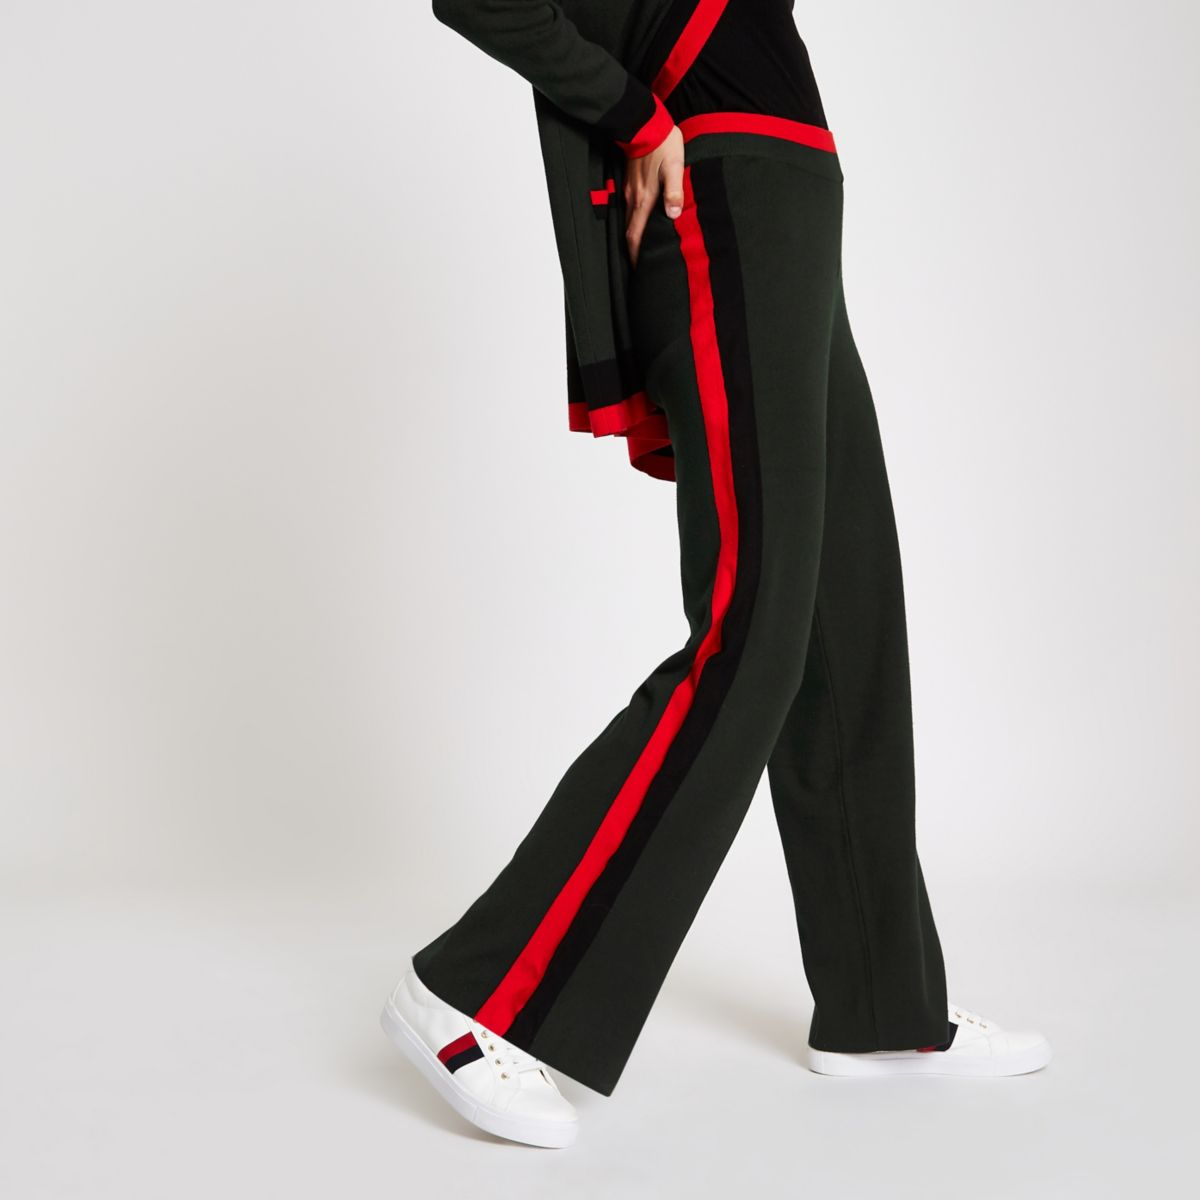 Khaki knitted side stripe pants